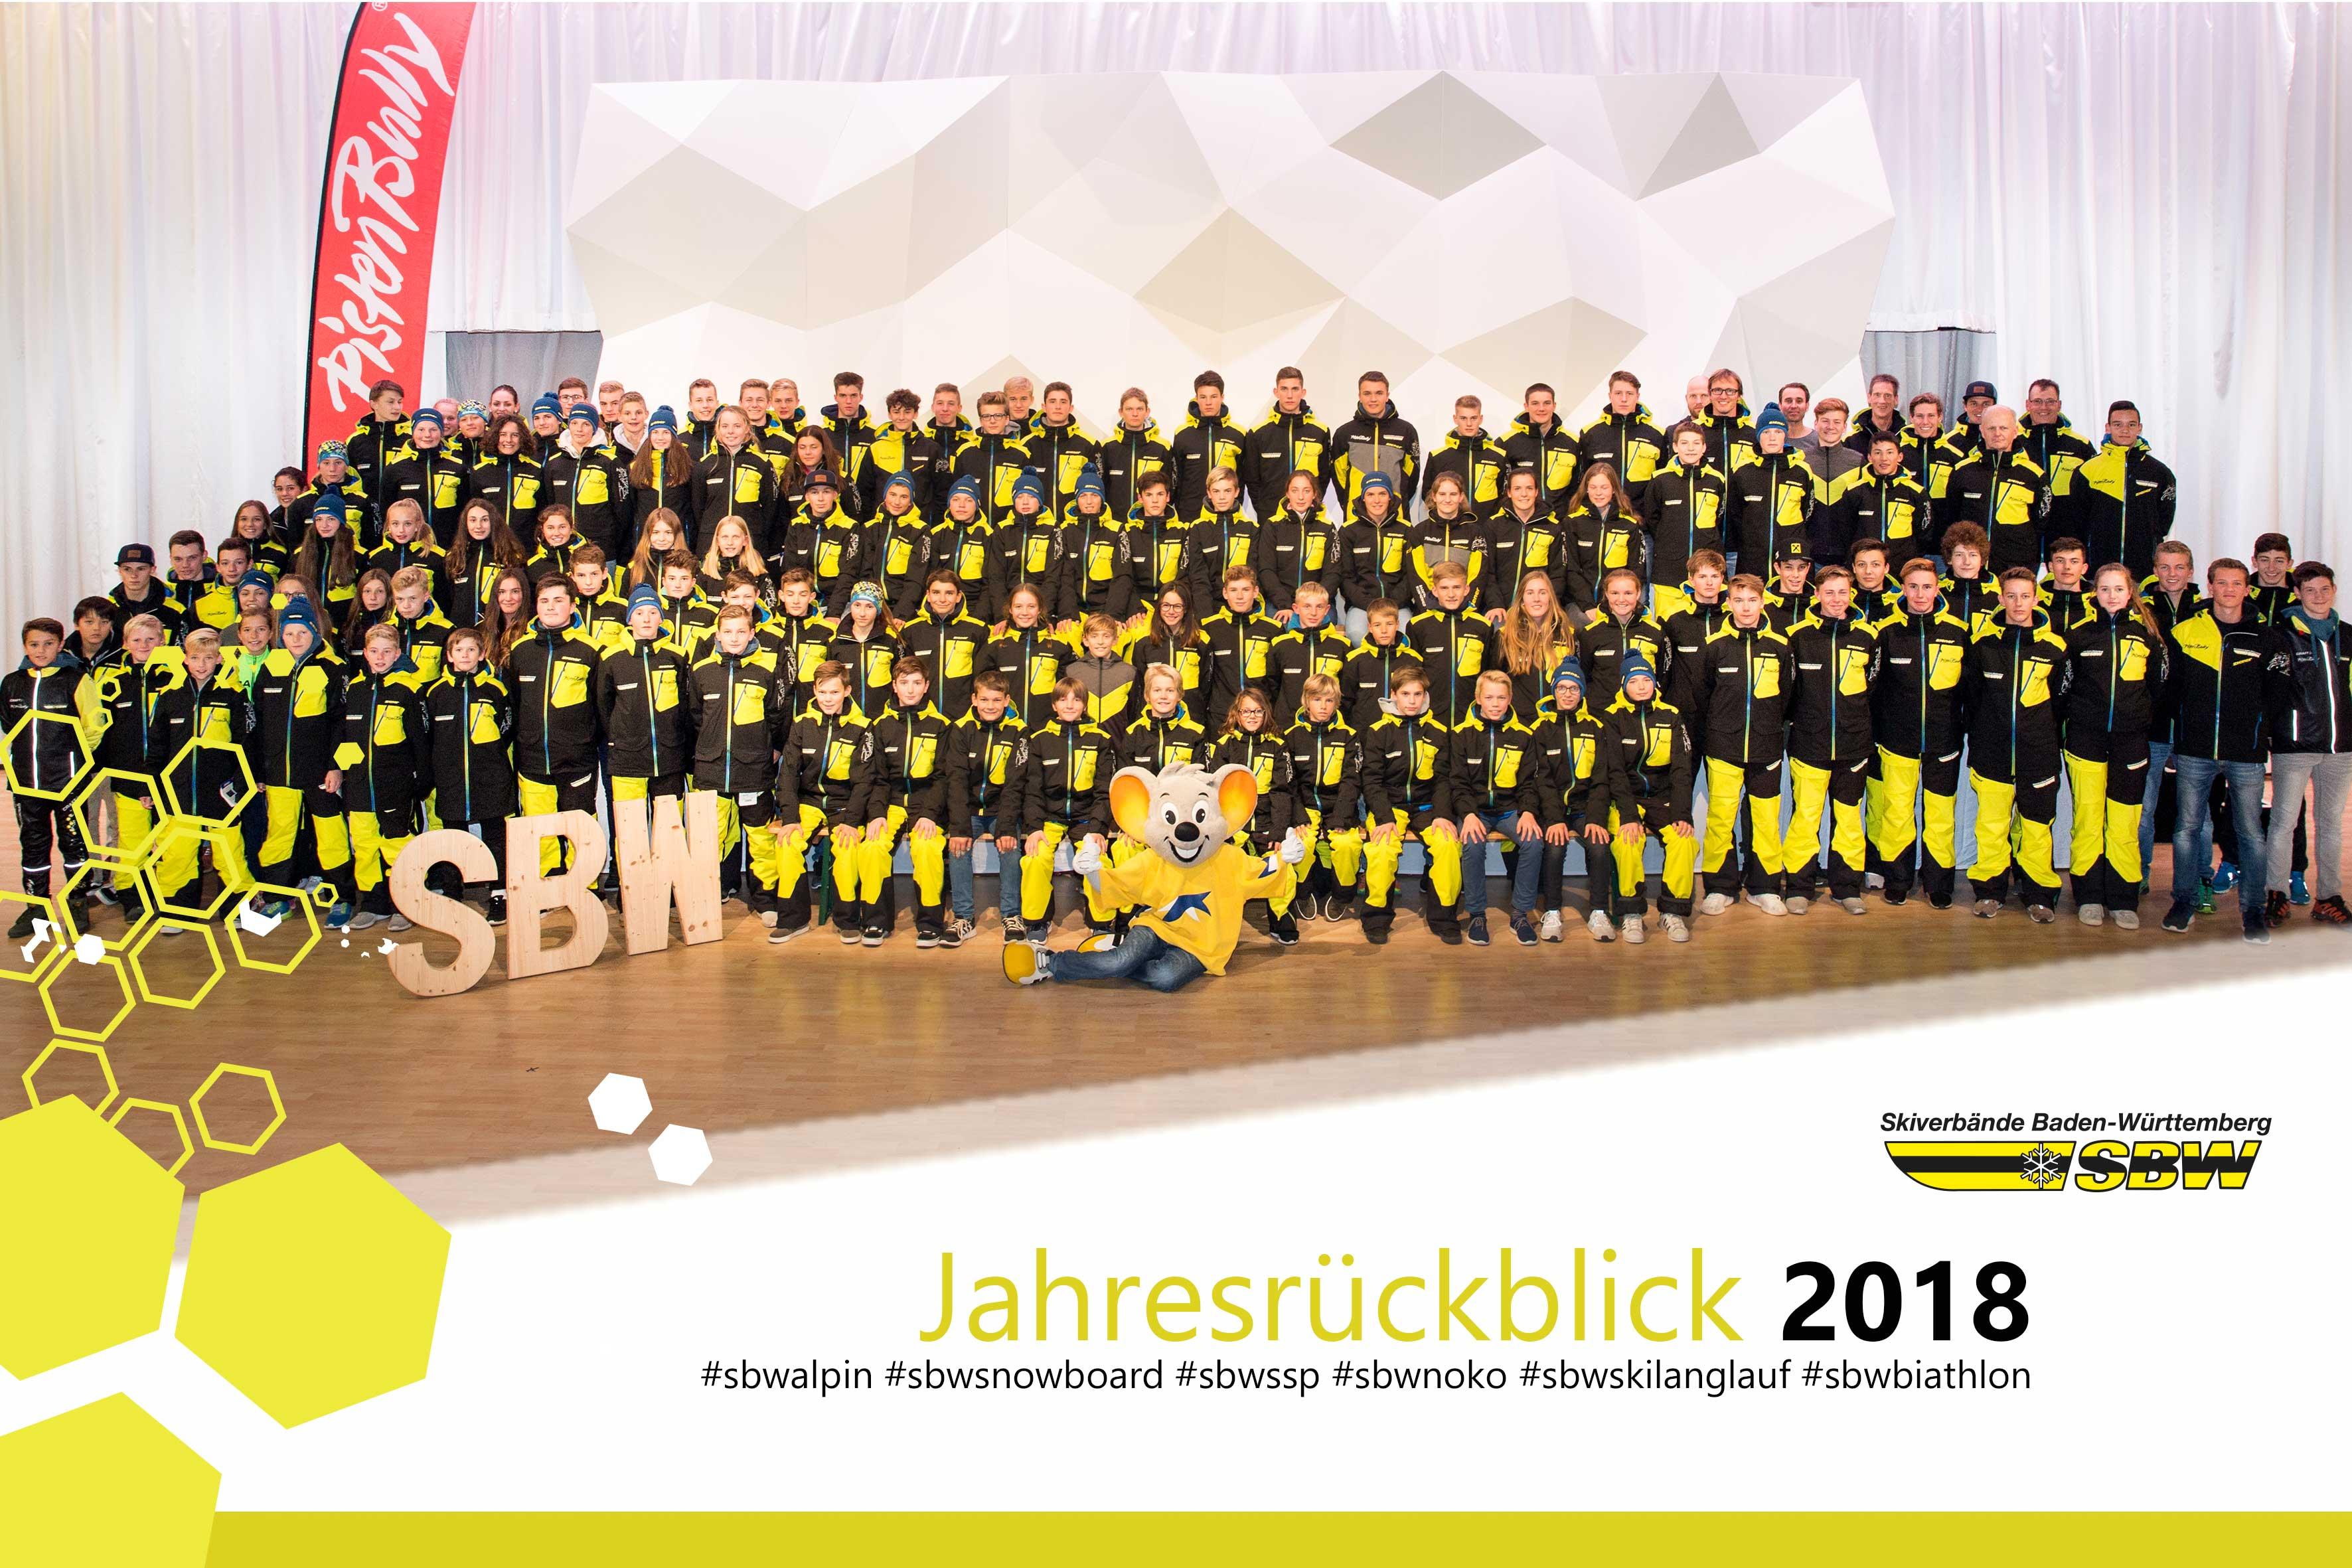 SBW Jahresrückblick 2018